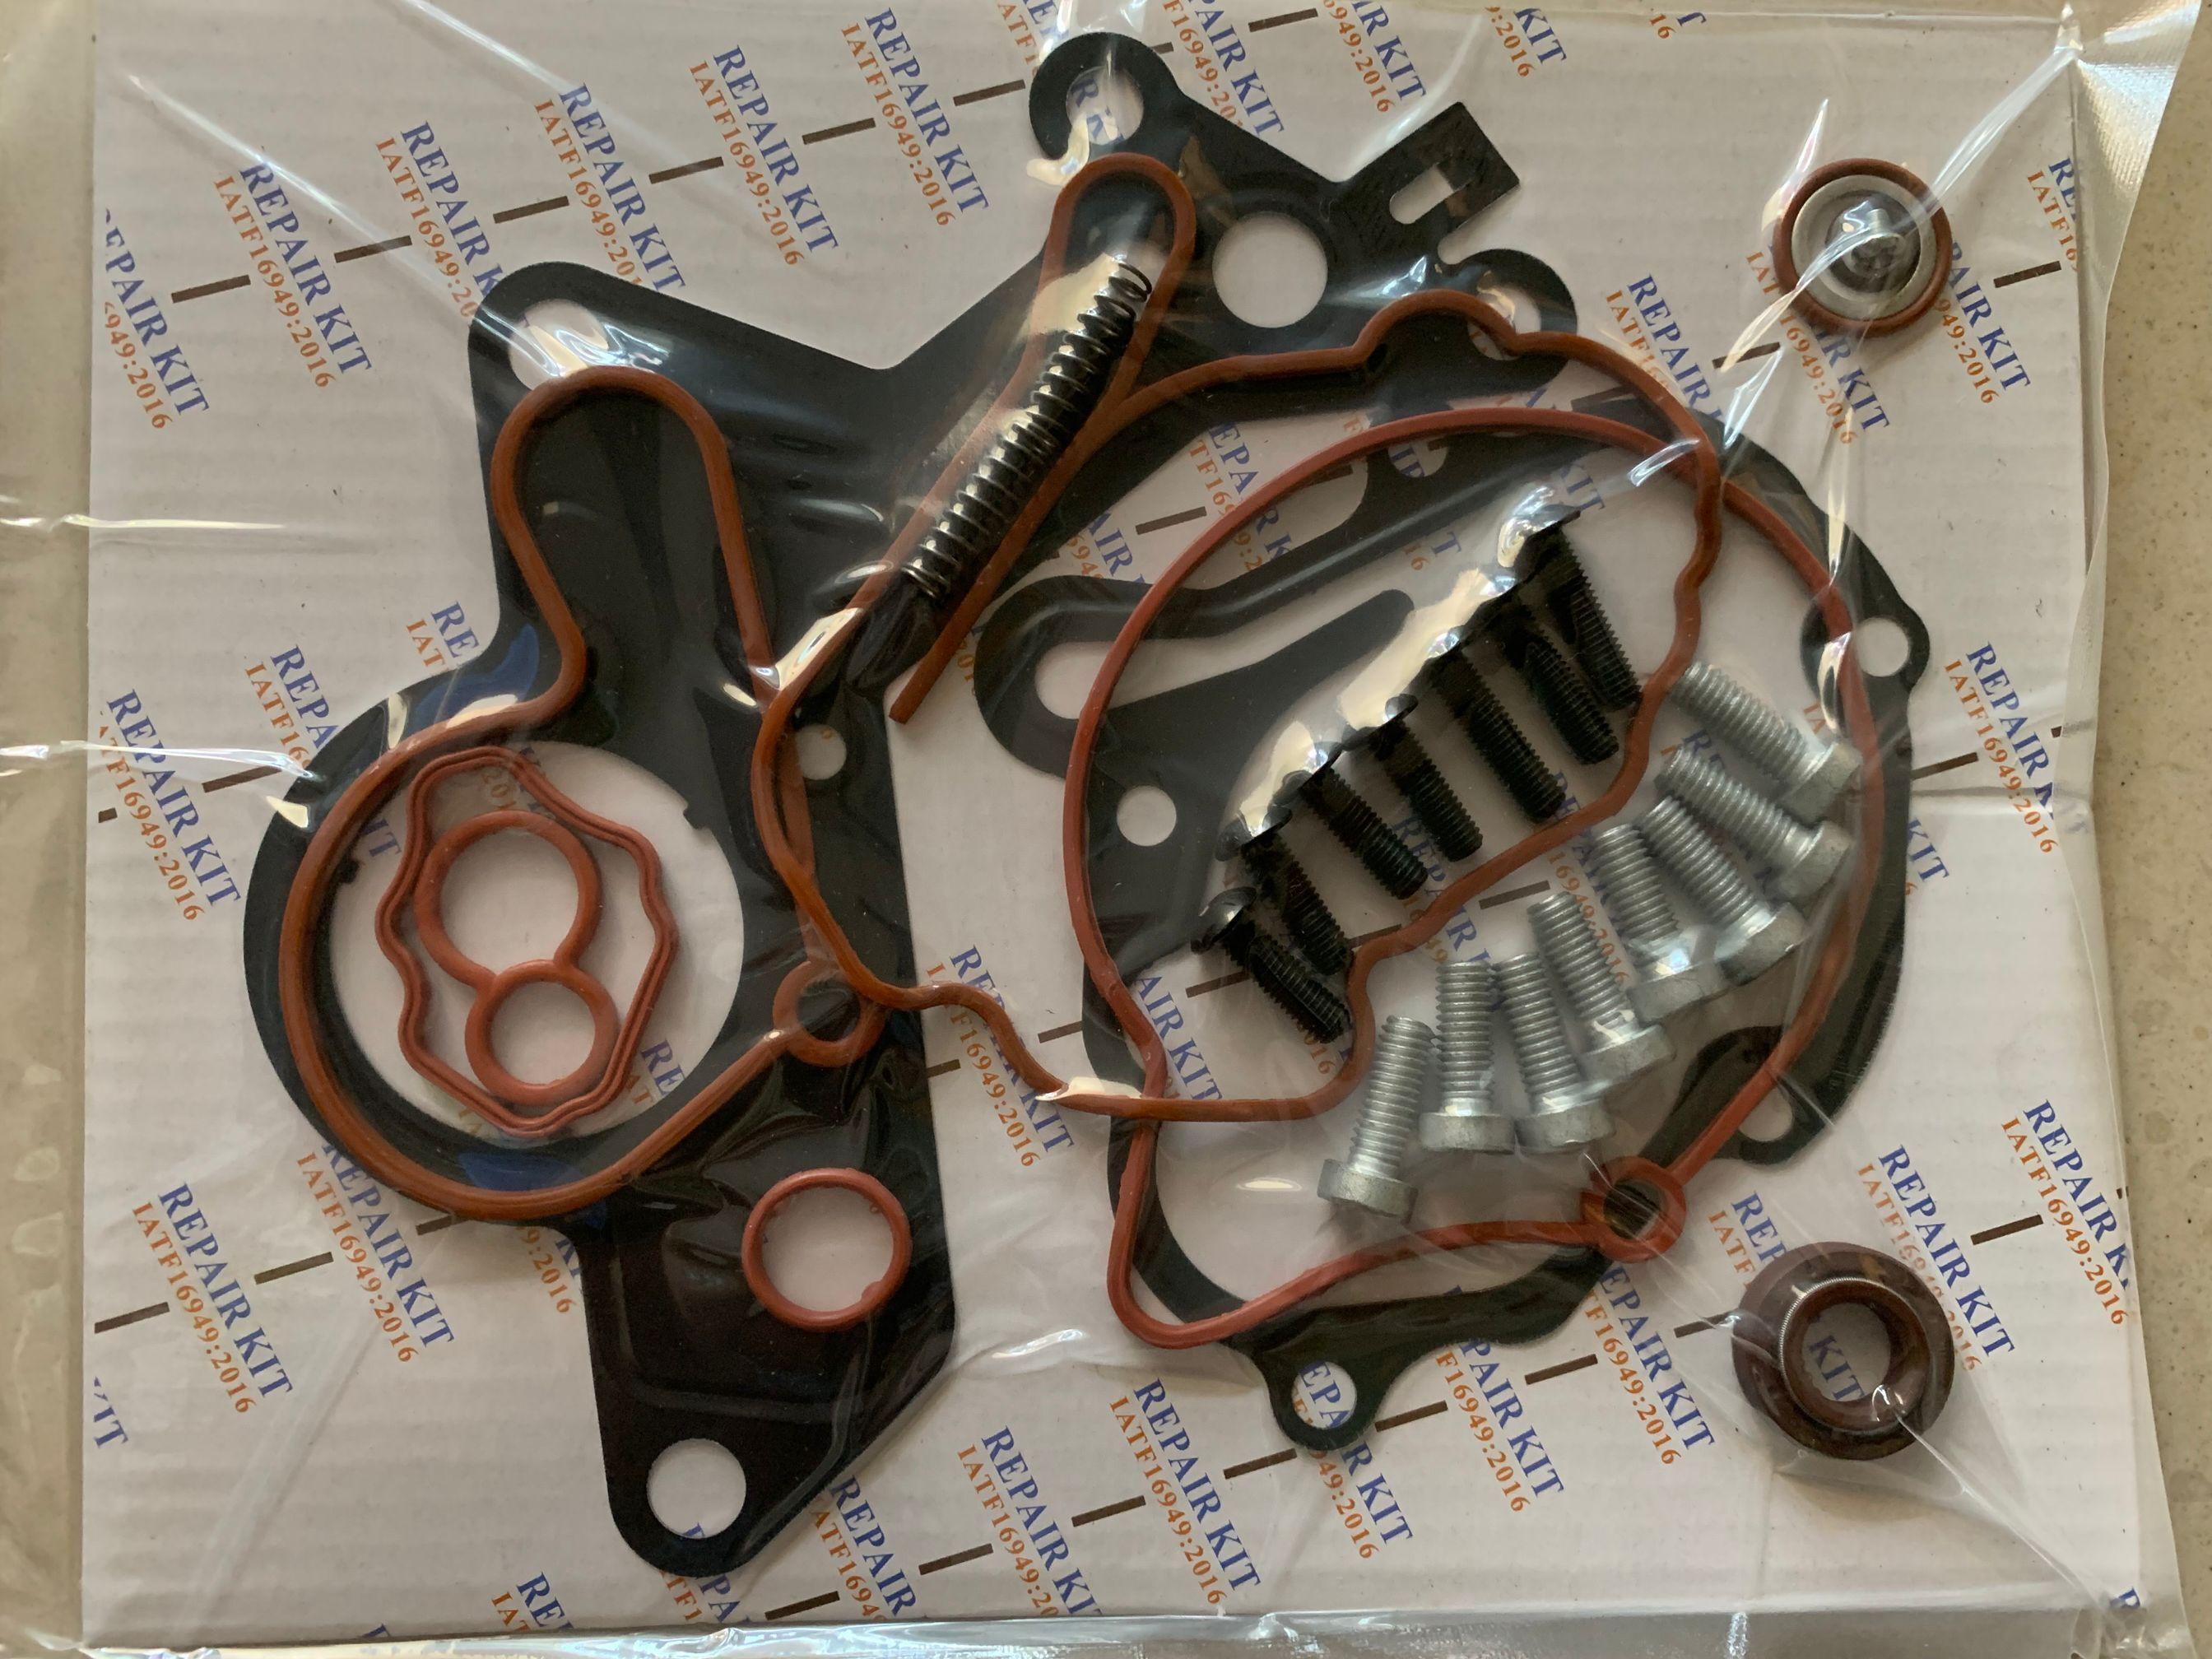 VW AUDI の座席 1.2TDI 1.4TDI 1.9TDI 2.0TDI 038145209 真空燃料タンデムポンプ修理キット